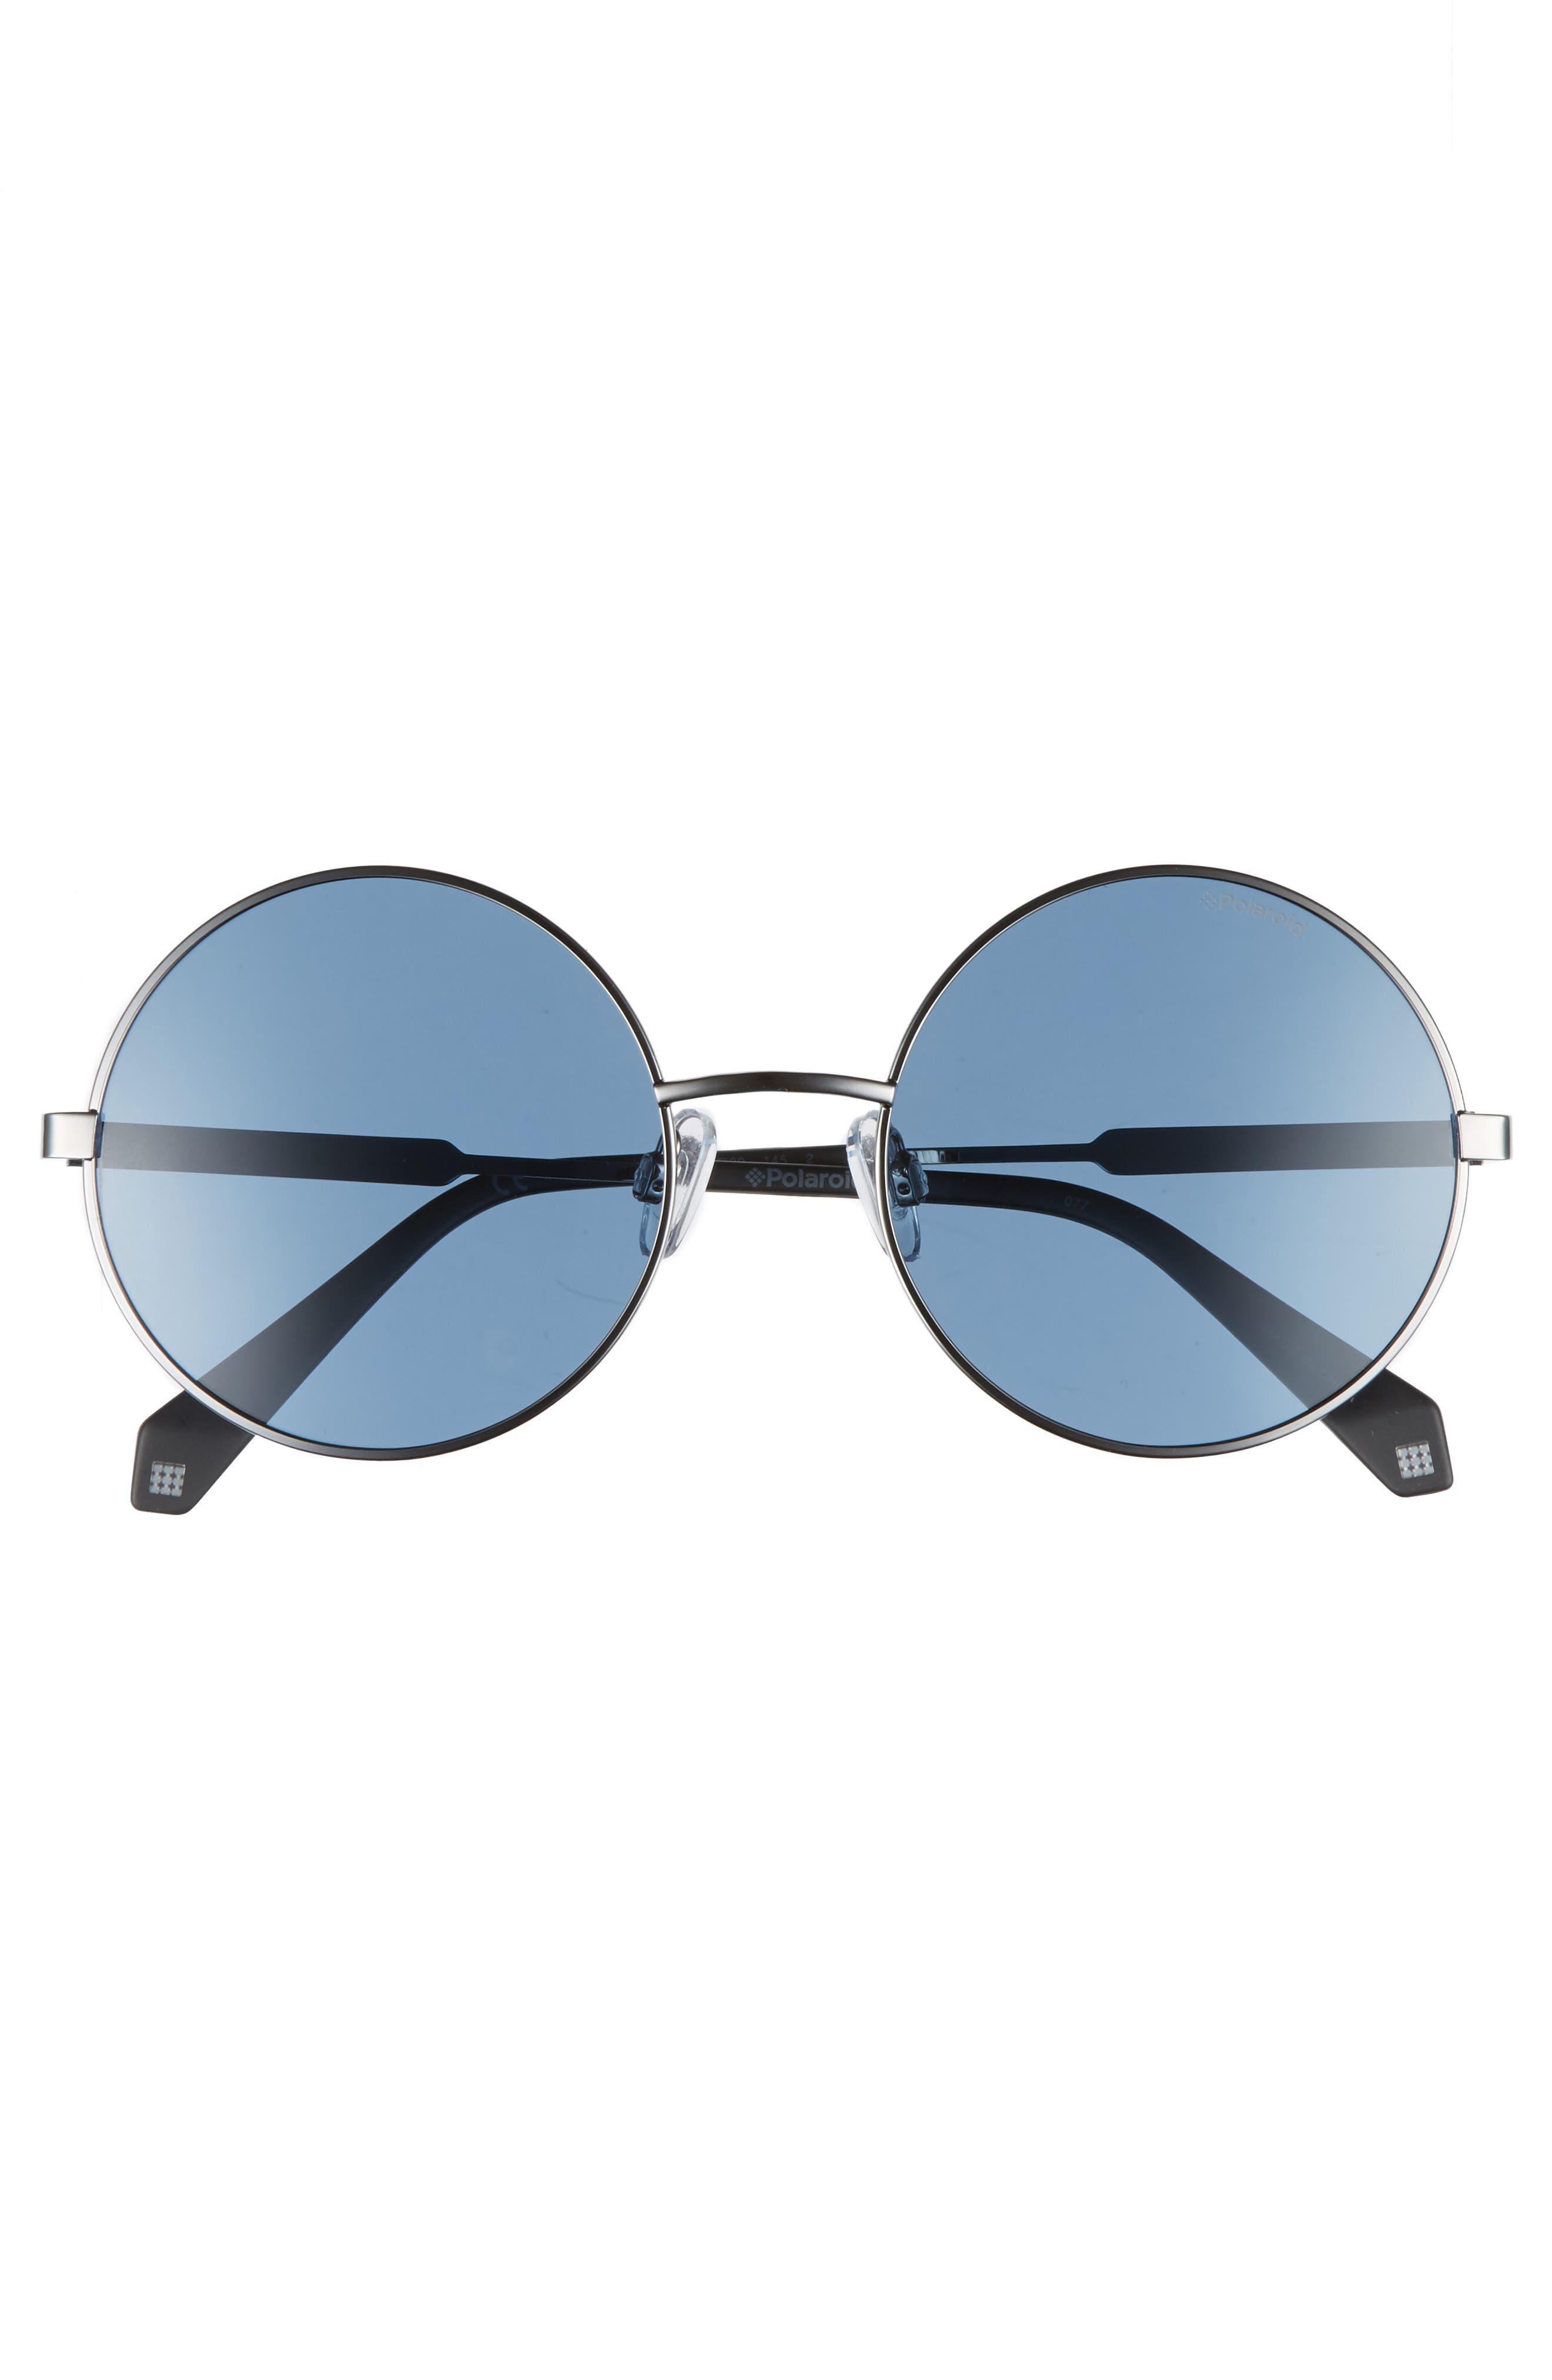 55mm Polarized Round Sunglasses,                             Alternate thumbnail 10, color,